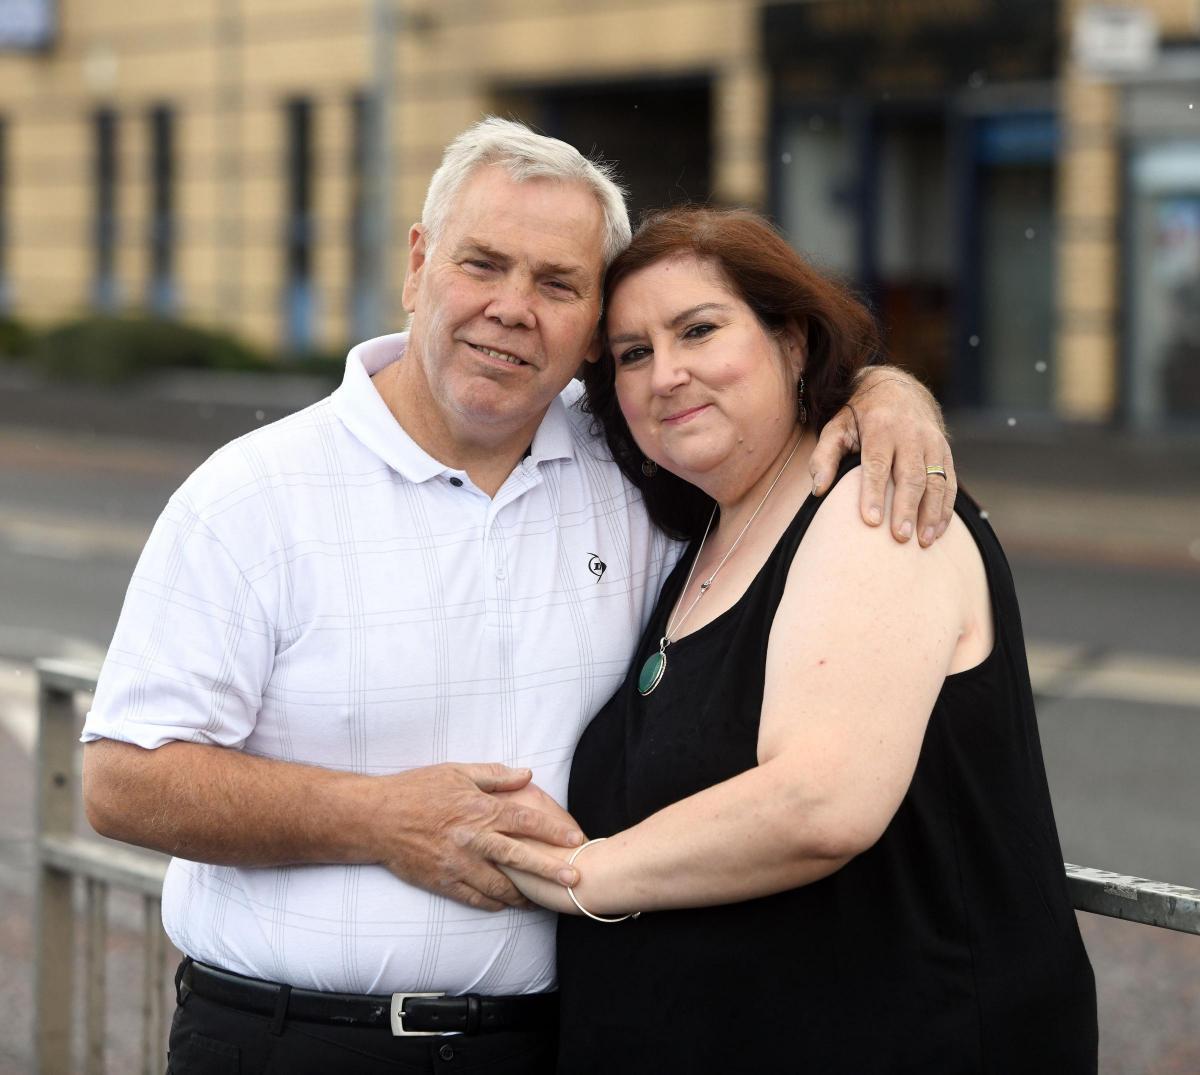 Glasgow Couple Dodged Wedding Reception For Citizens Theatre